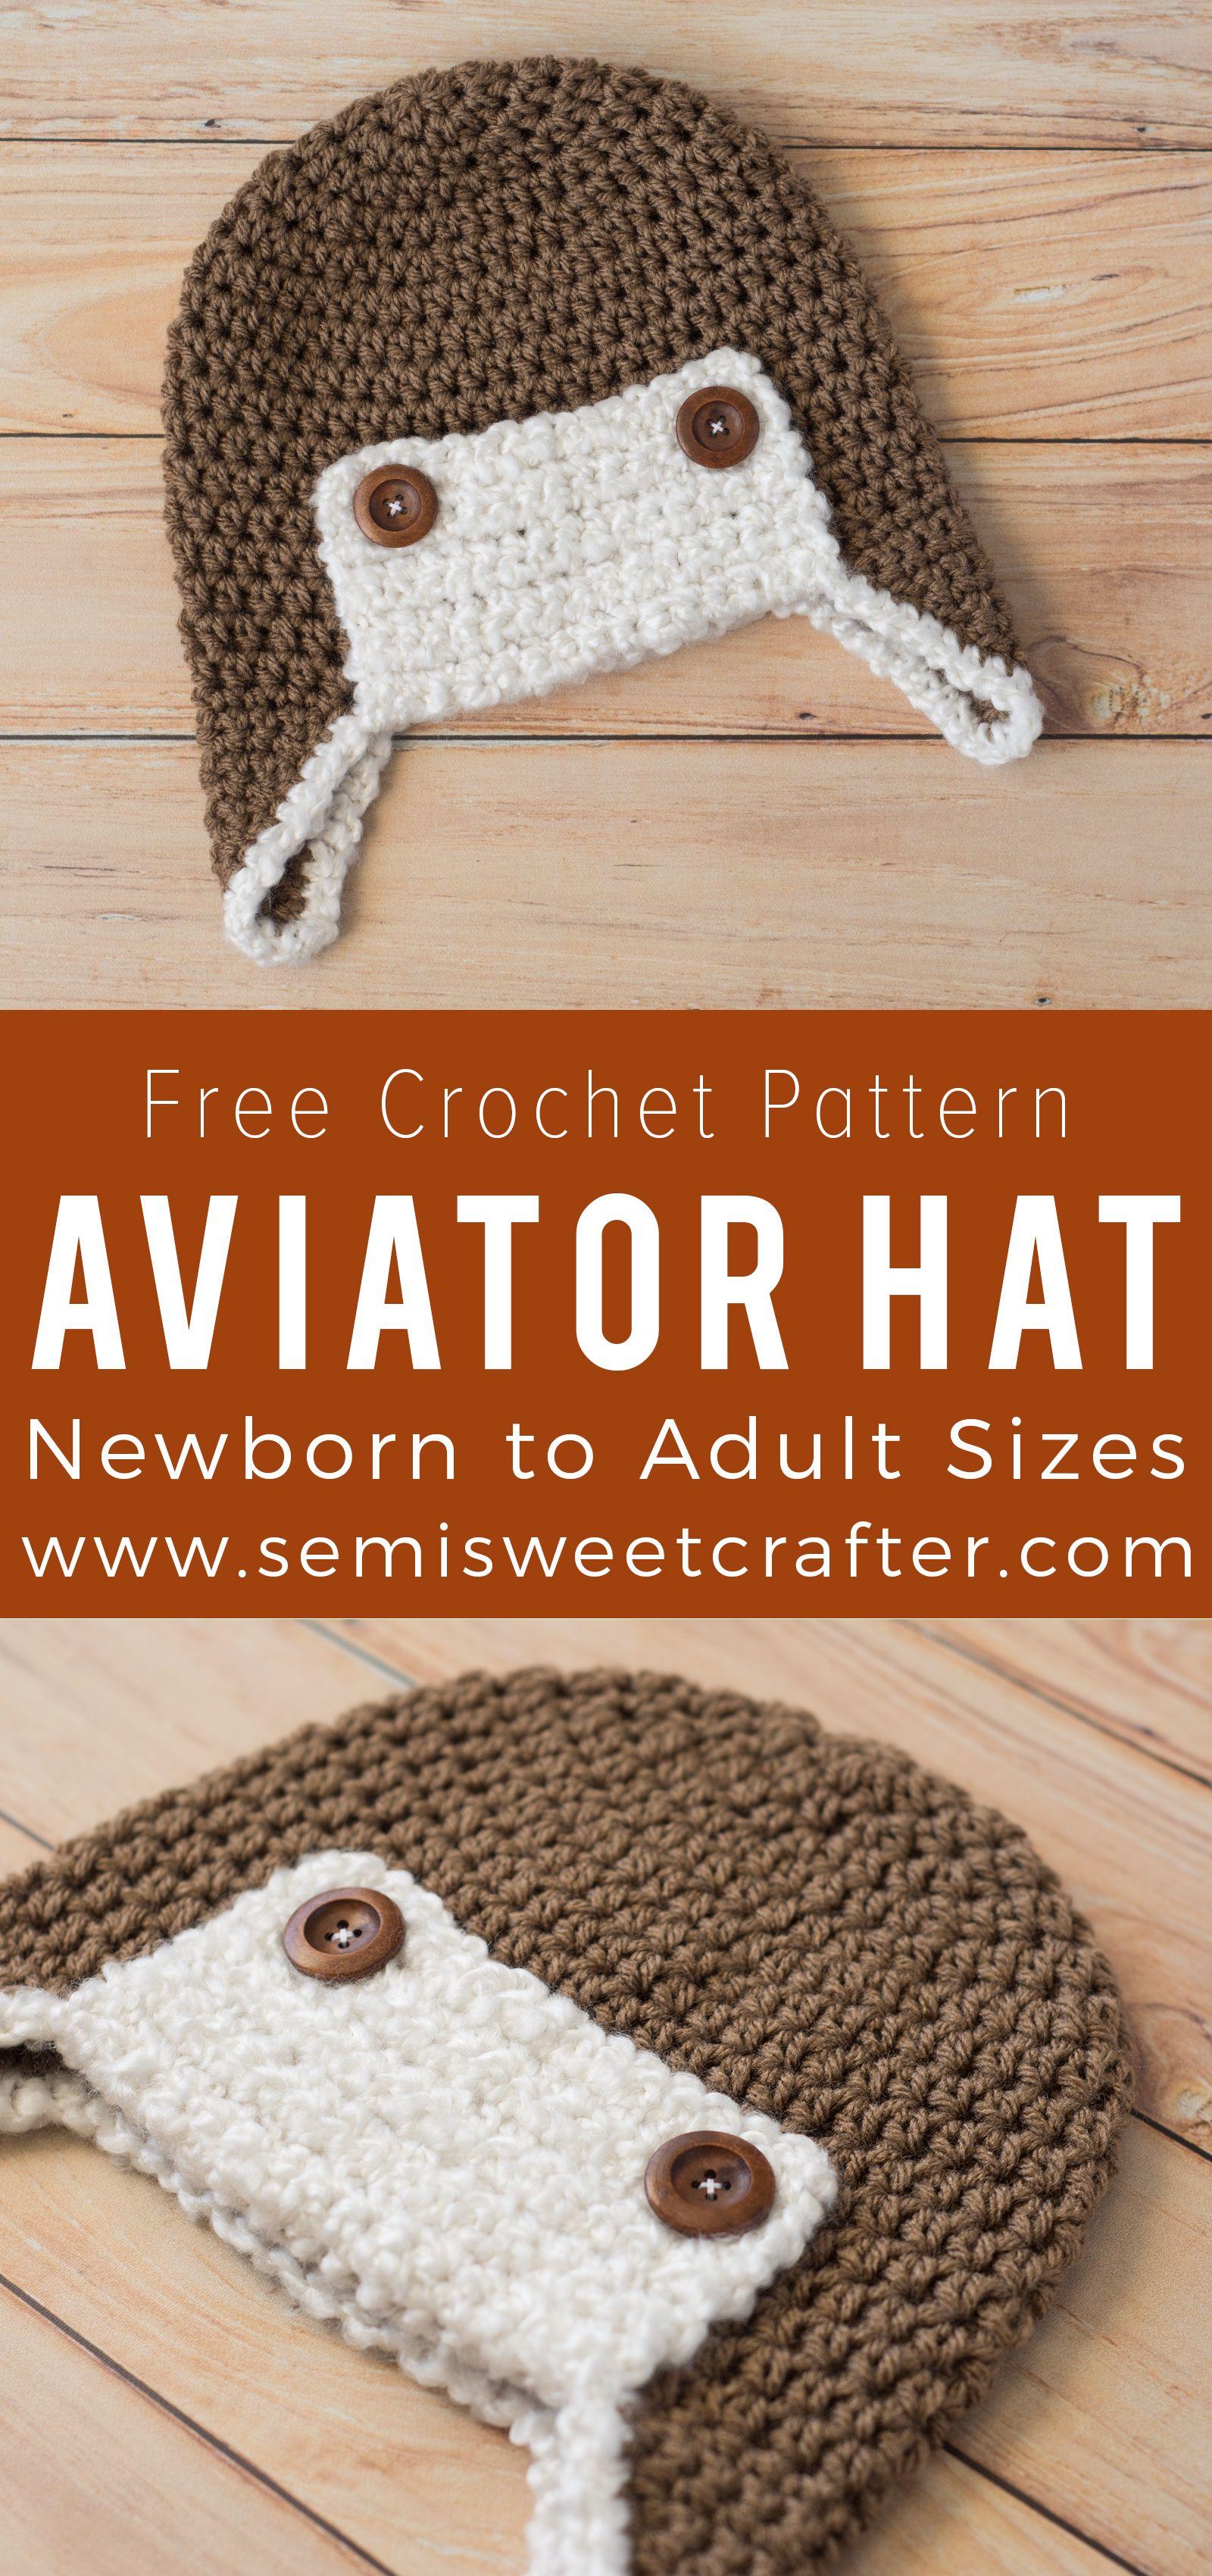 Aviator Hat | Crocheting | Pinterest | Tejido